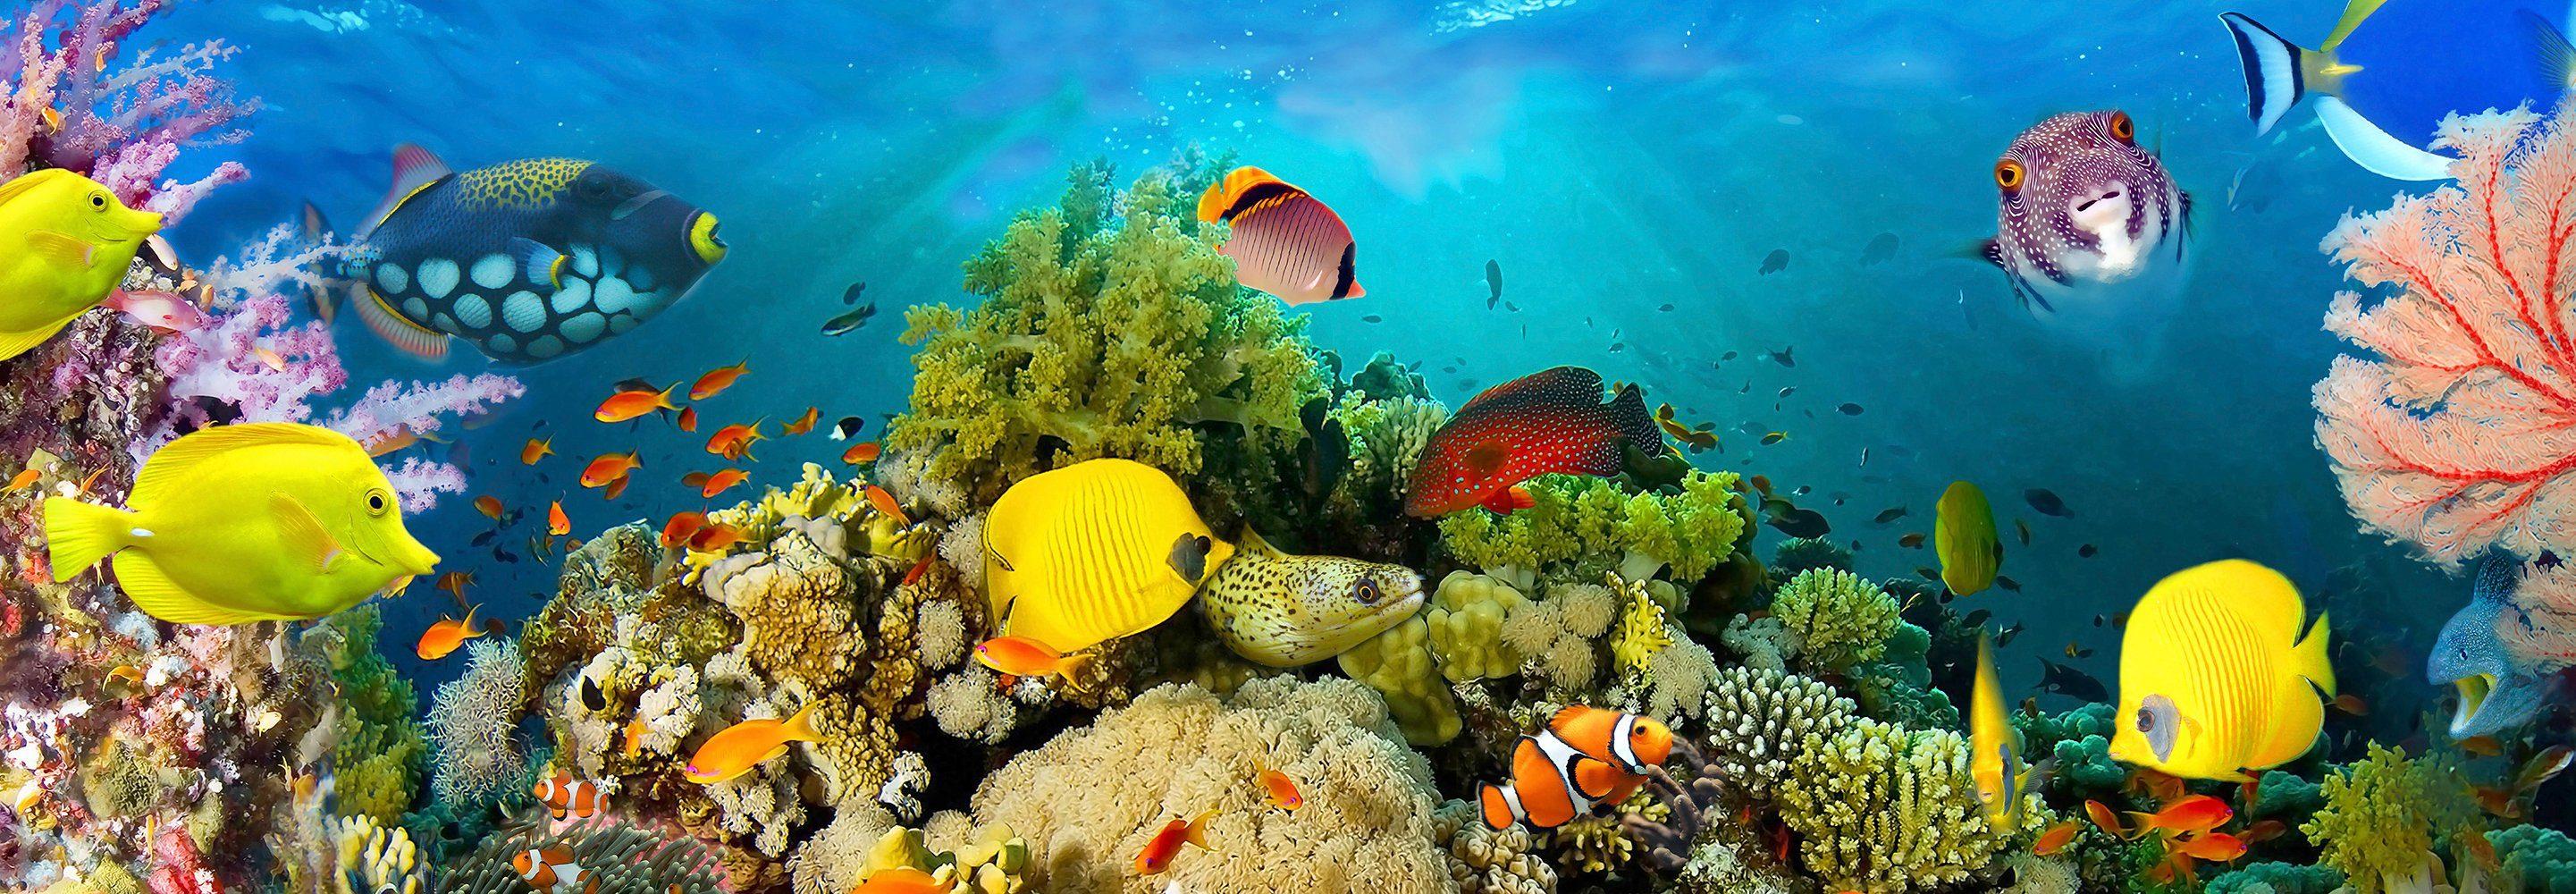 Vliestapete »Sea Corals«, 366x127cm, 4-teilig